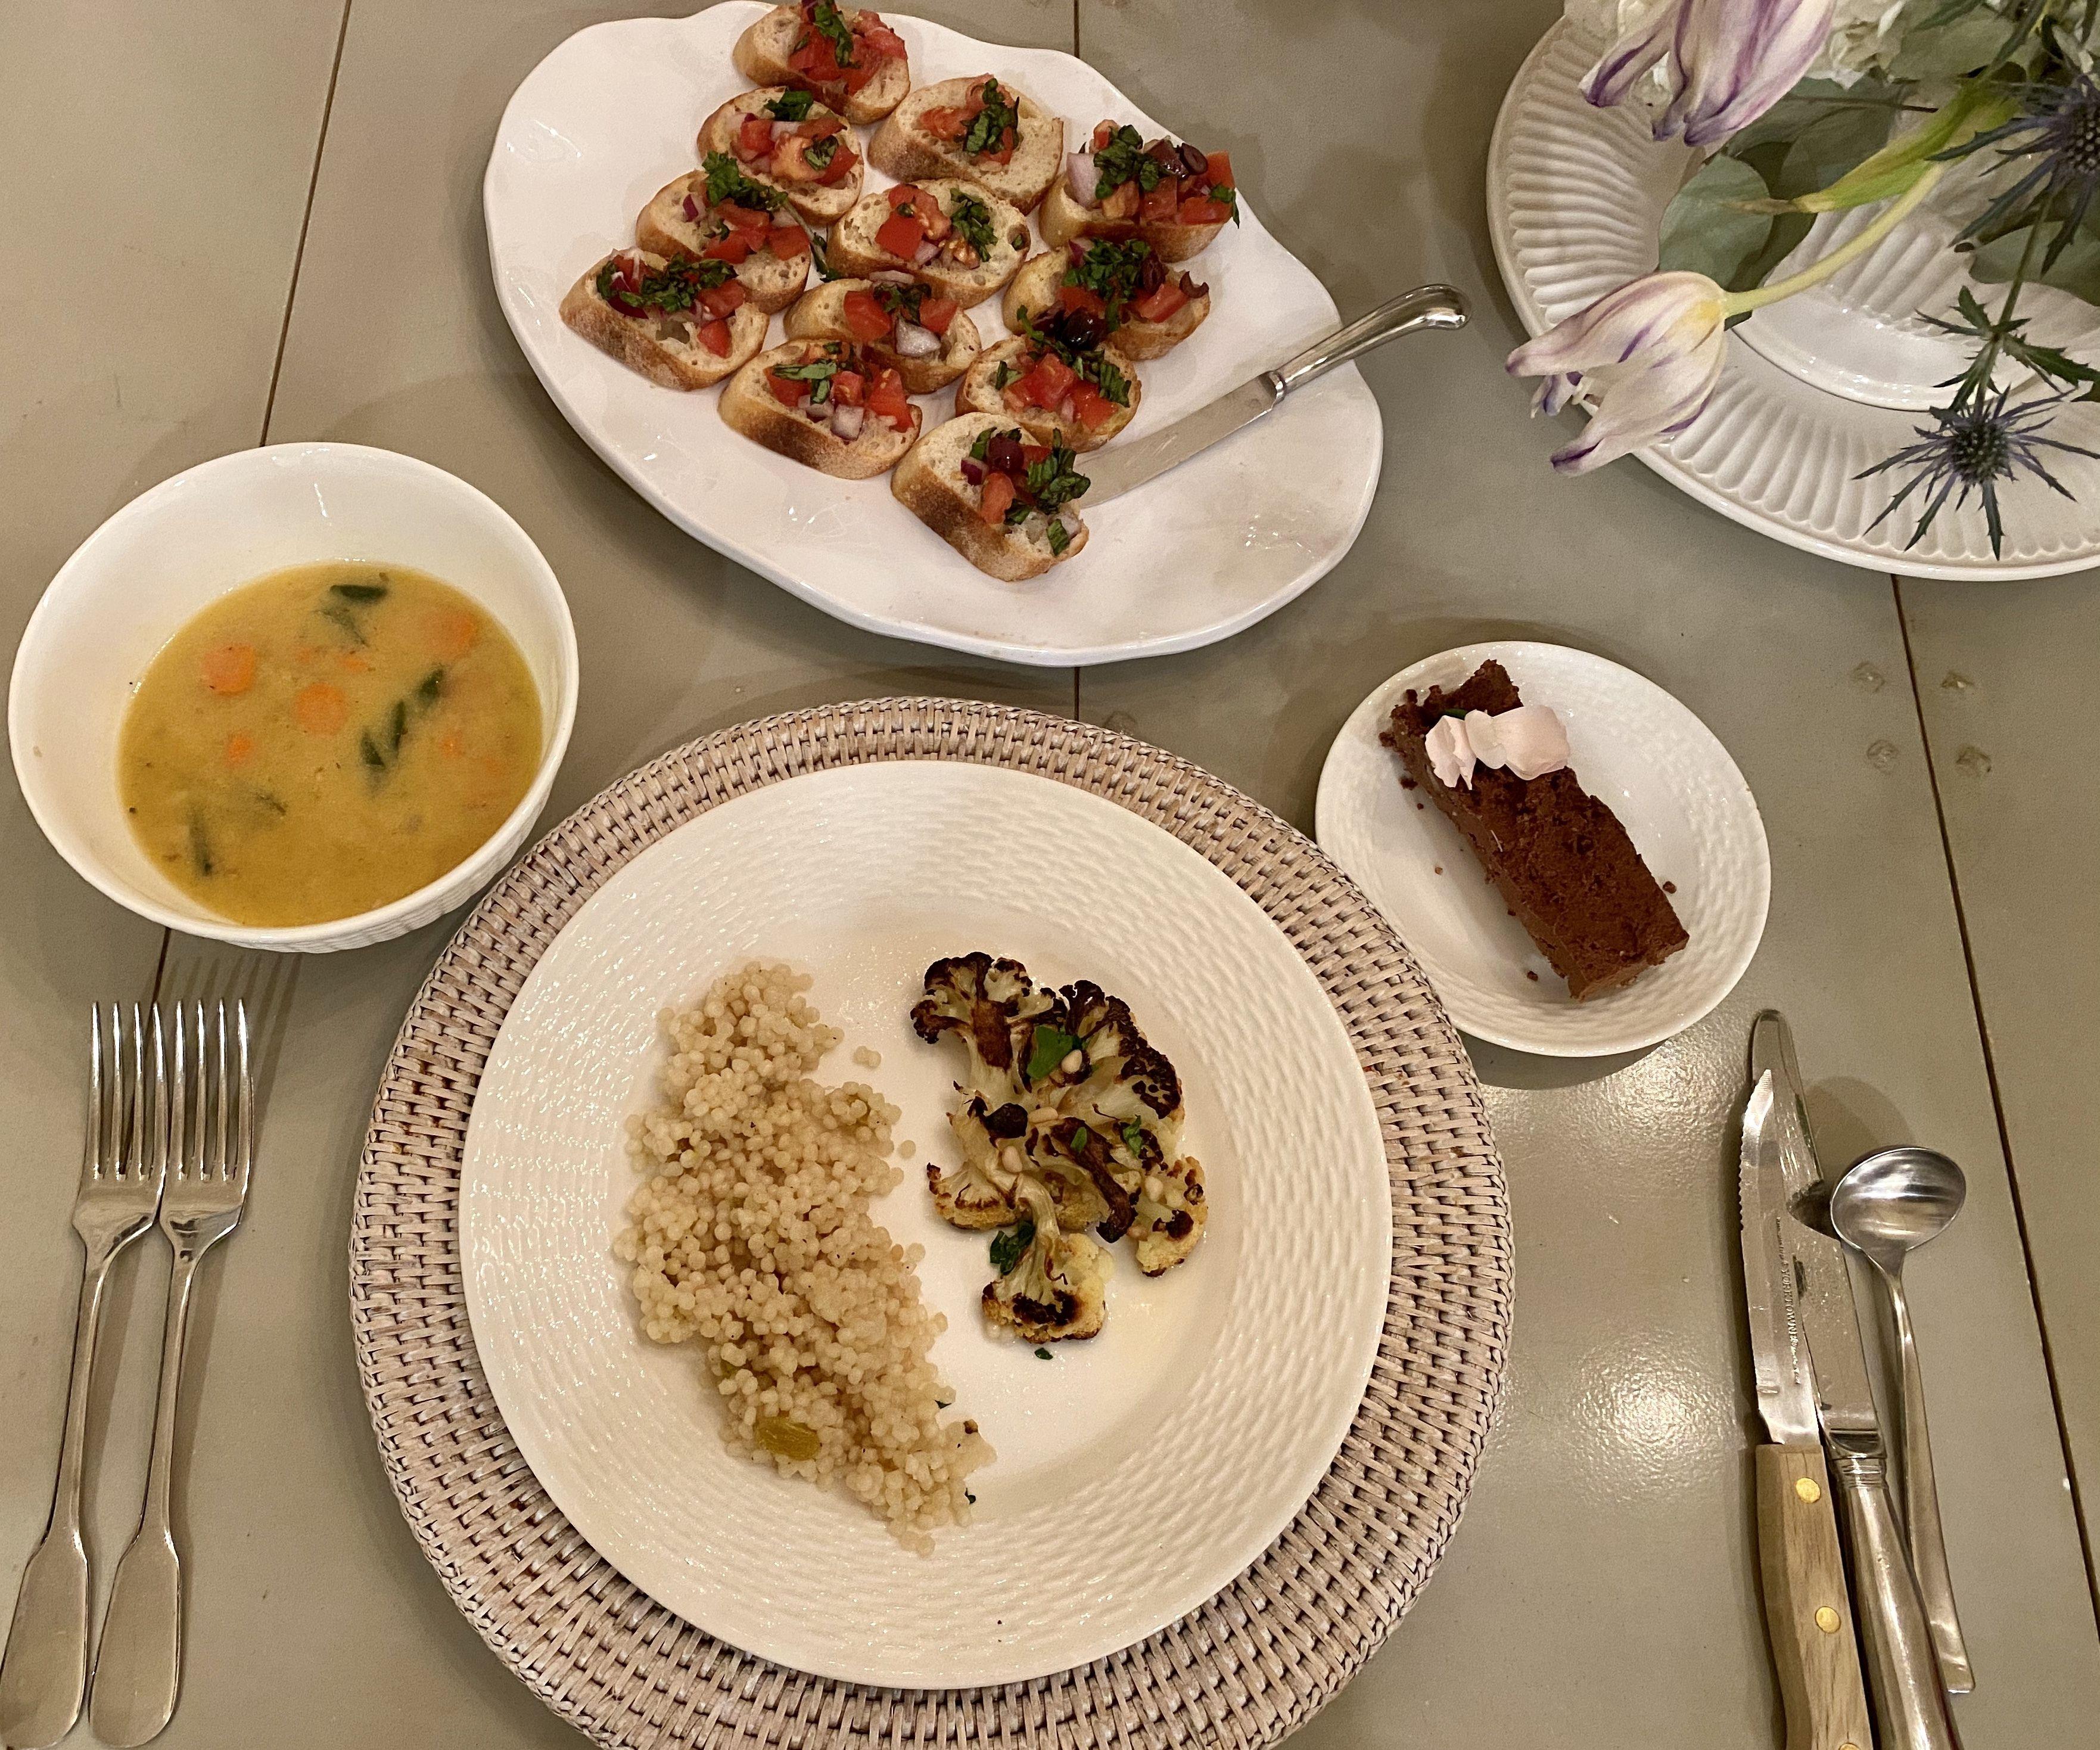 VEGAN Four Course Meal